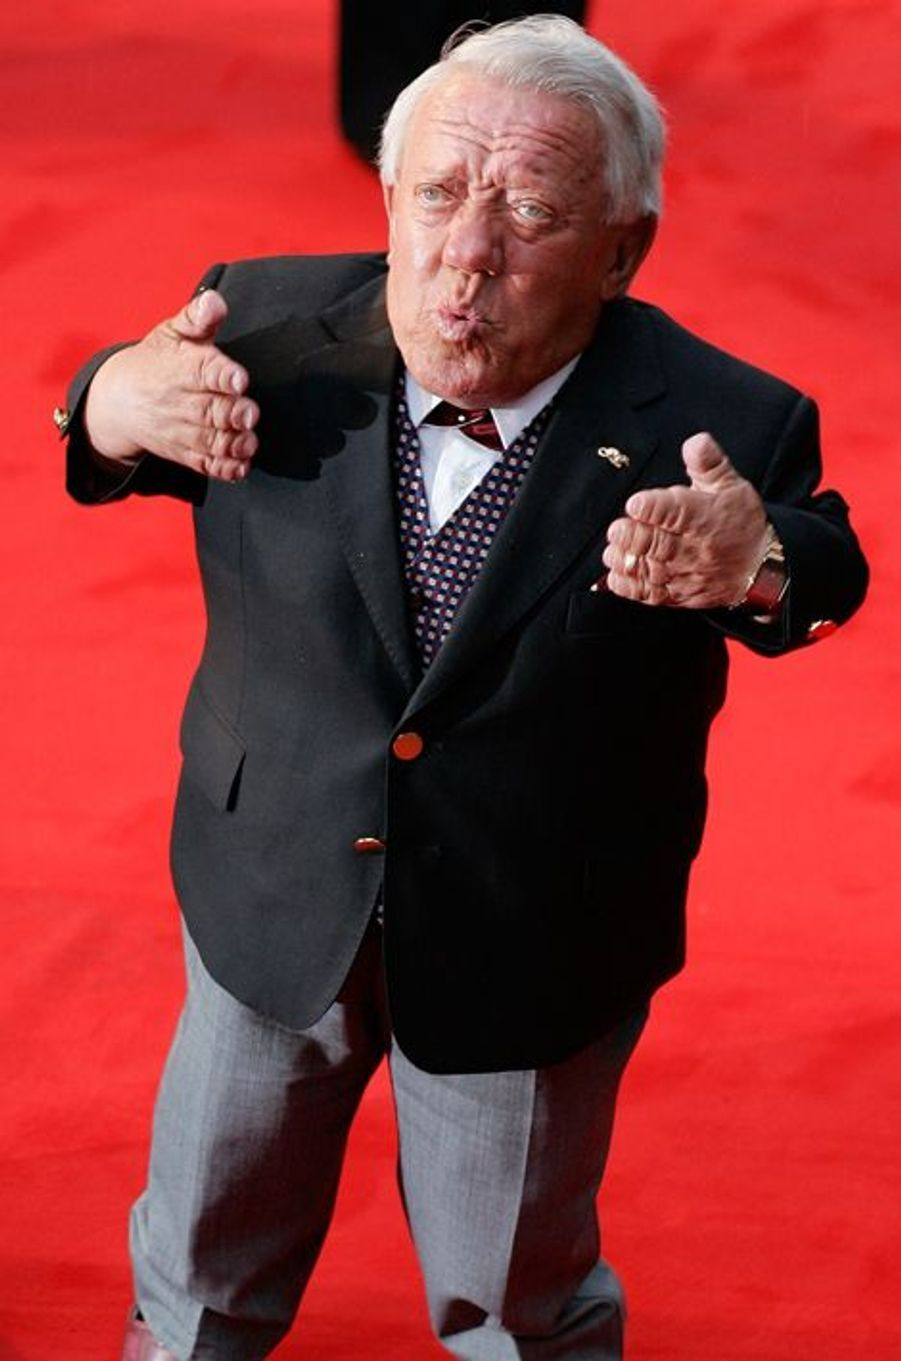 Kenny Baker (C3PO)